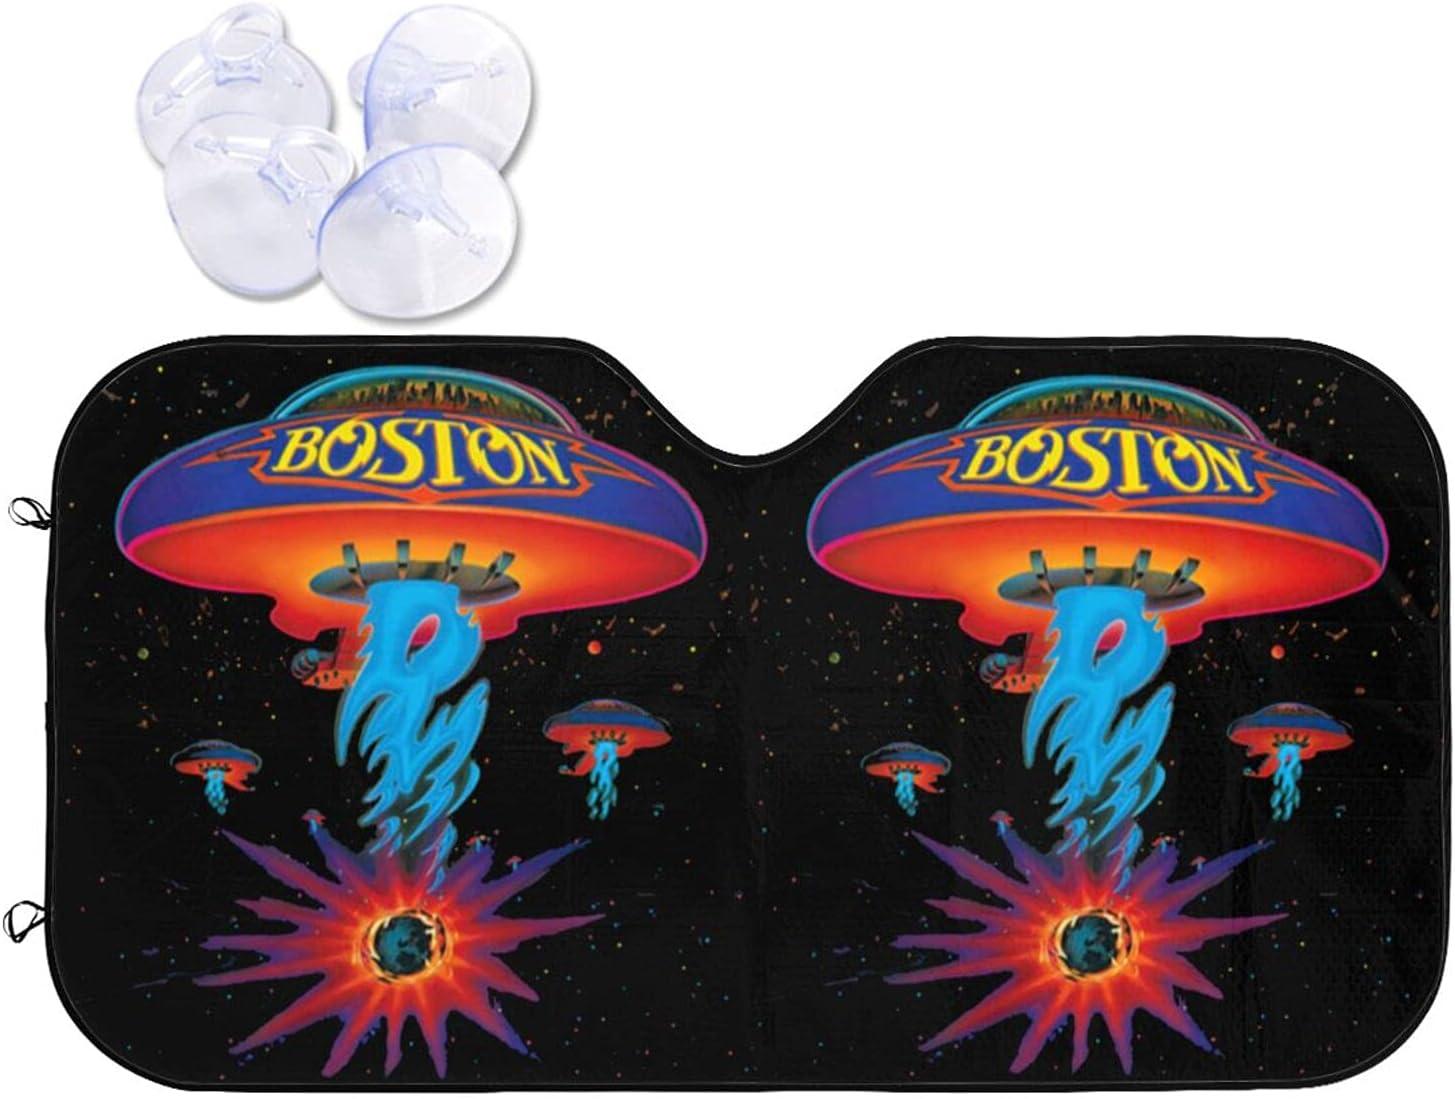 Boston Free Shipping New Rock Band Car Sunshade Heat and Prevention Windshield Sun Atlanta Mall